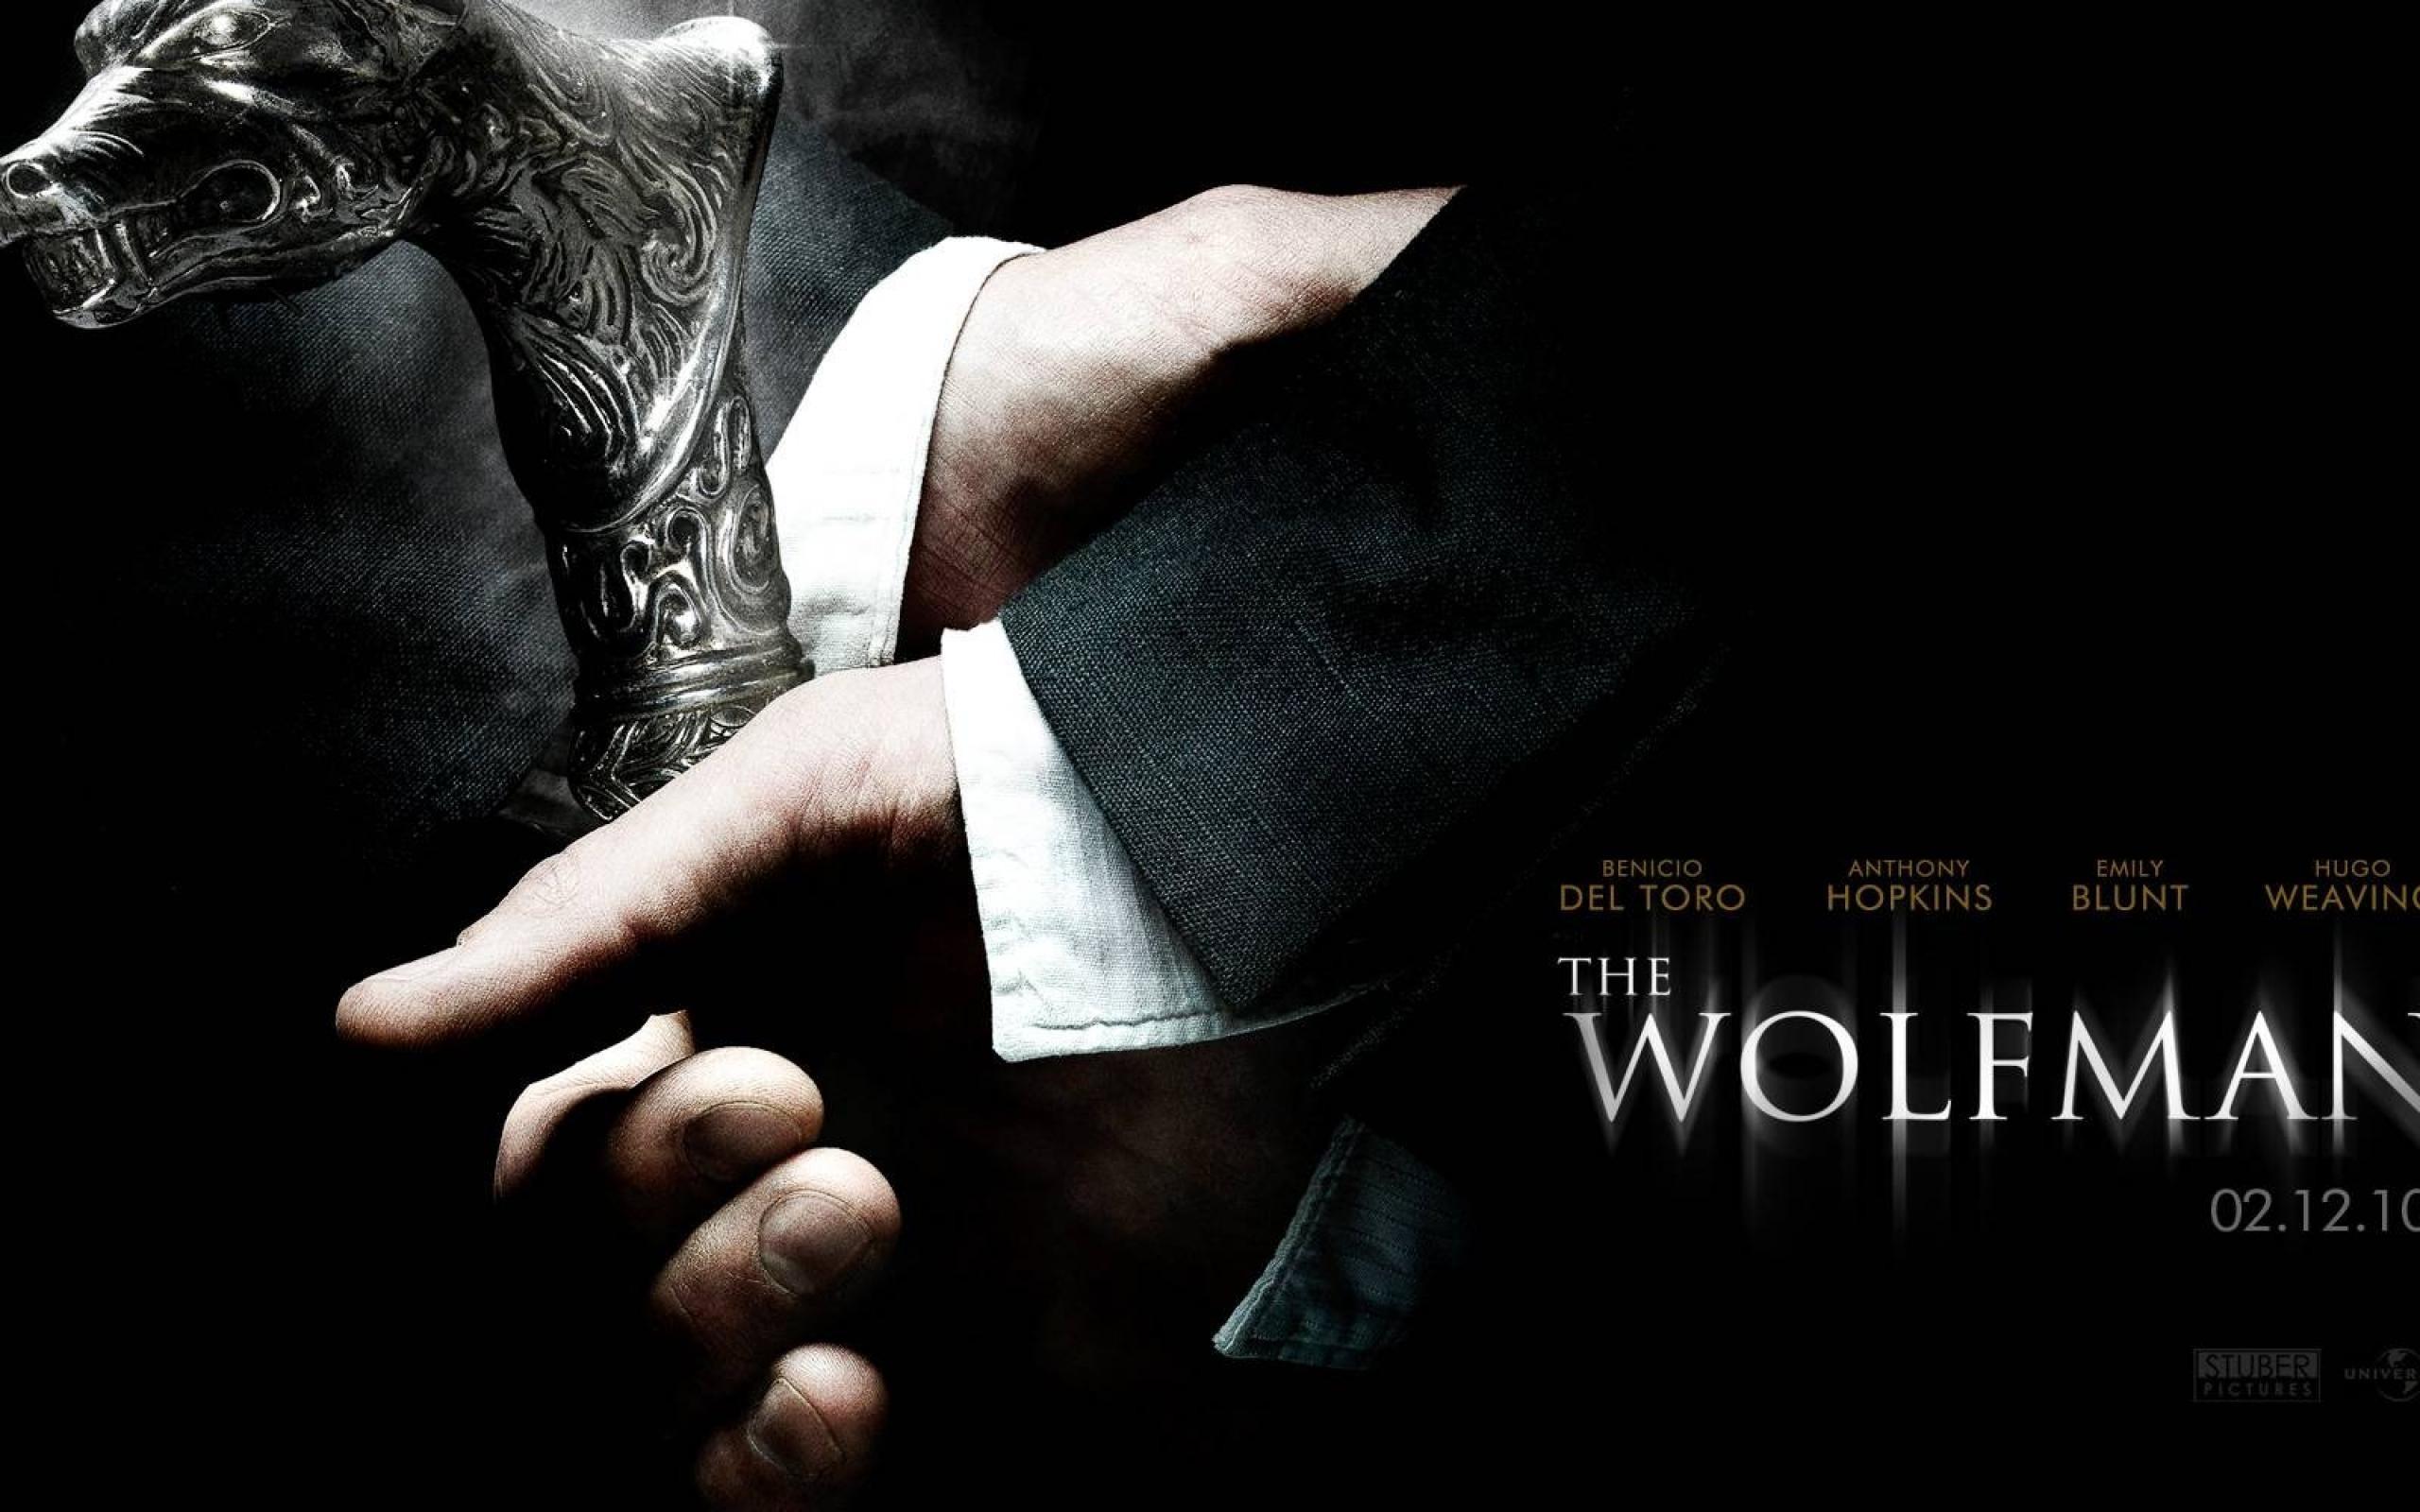 The Wolfman Hd Movie Wallpaper 14 Avance 10wallpapercom